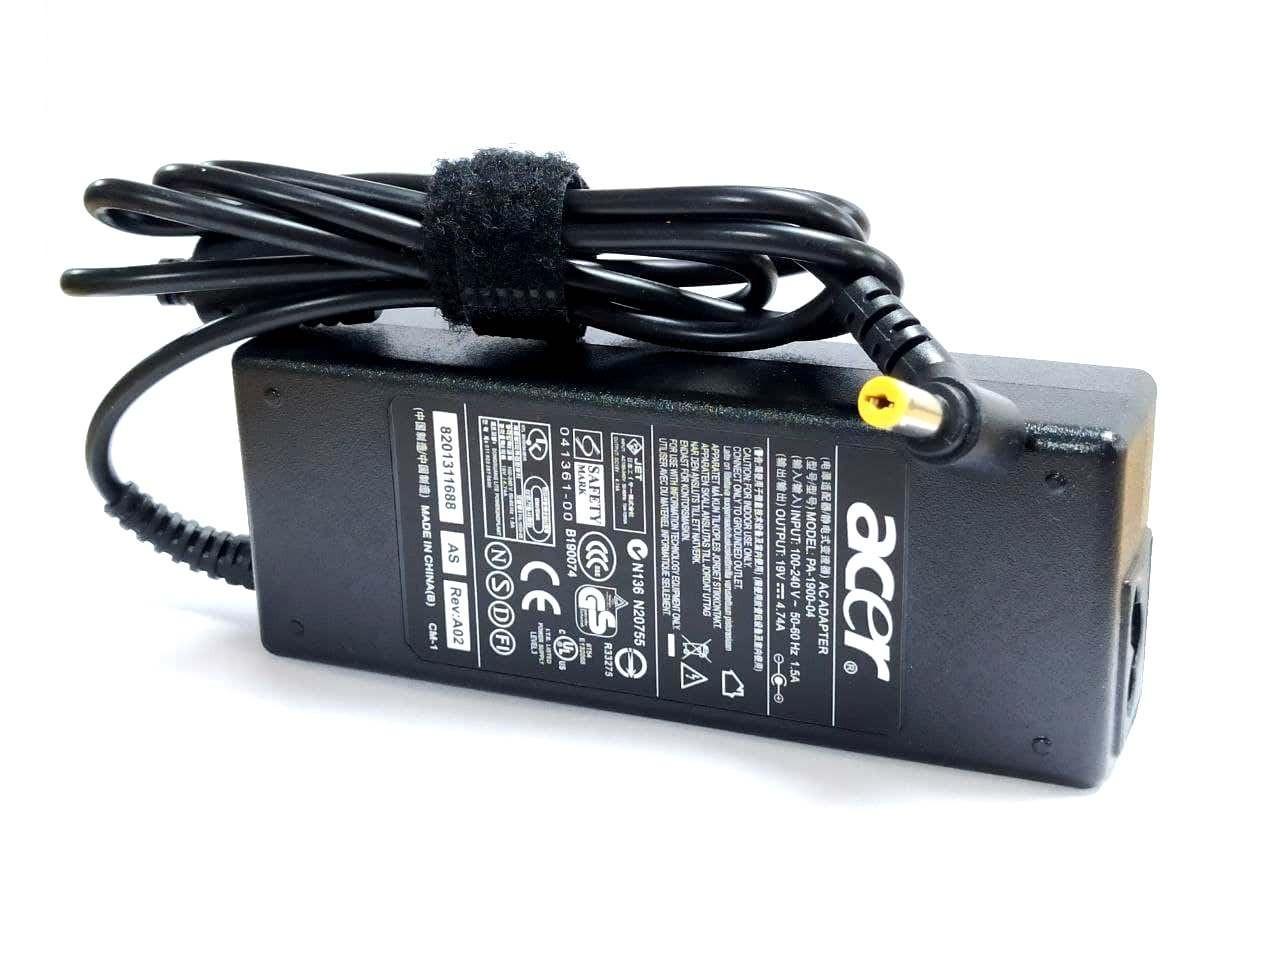 Блок питания для ноутбука Acer Aspire 7112WSMi 19V 4.74A 90W